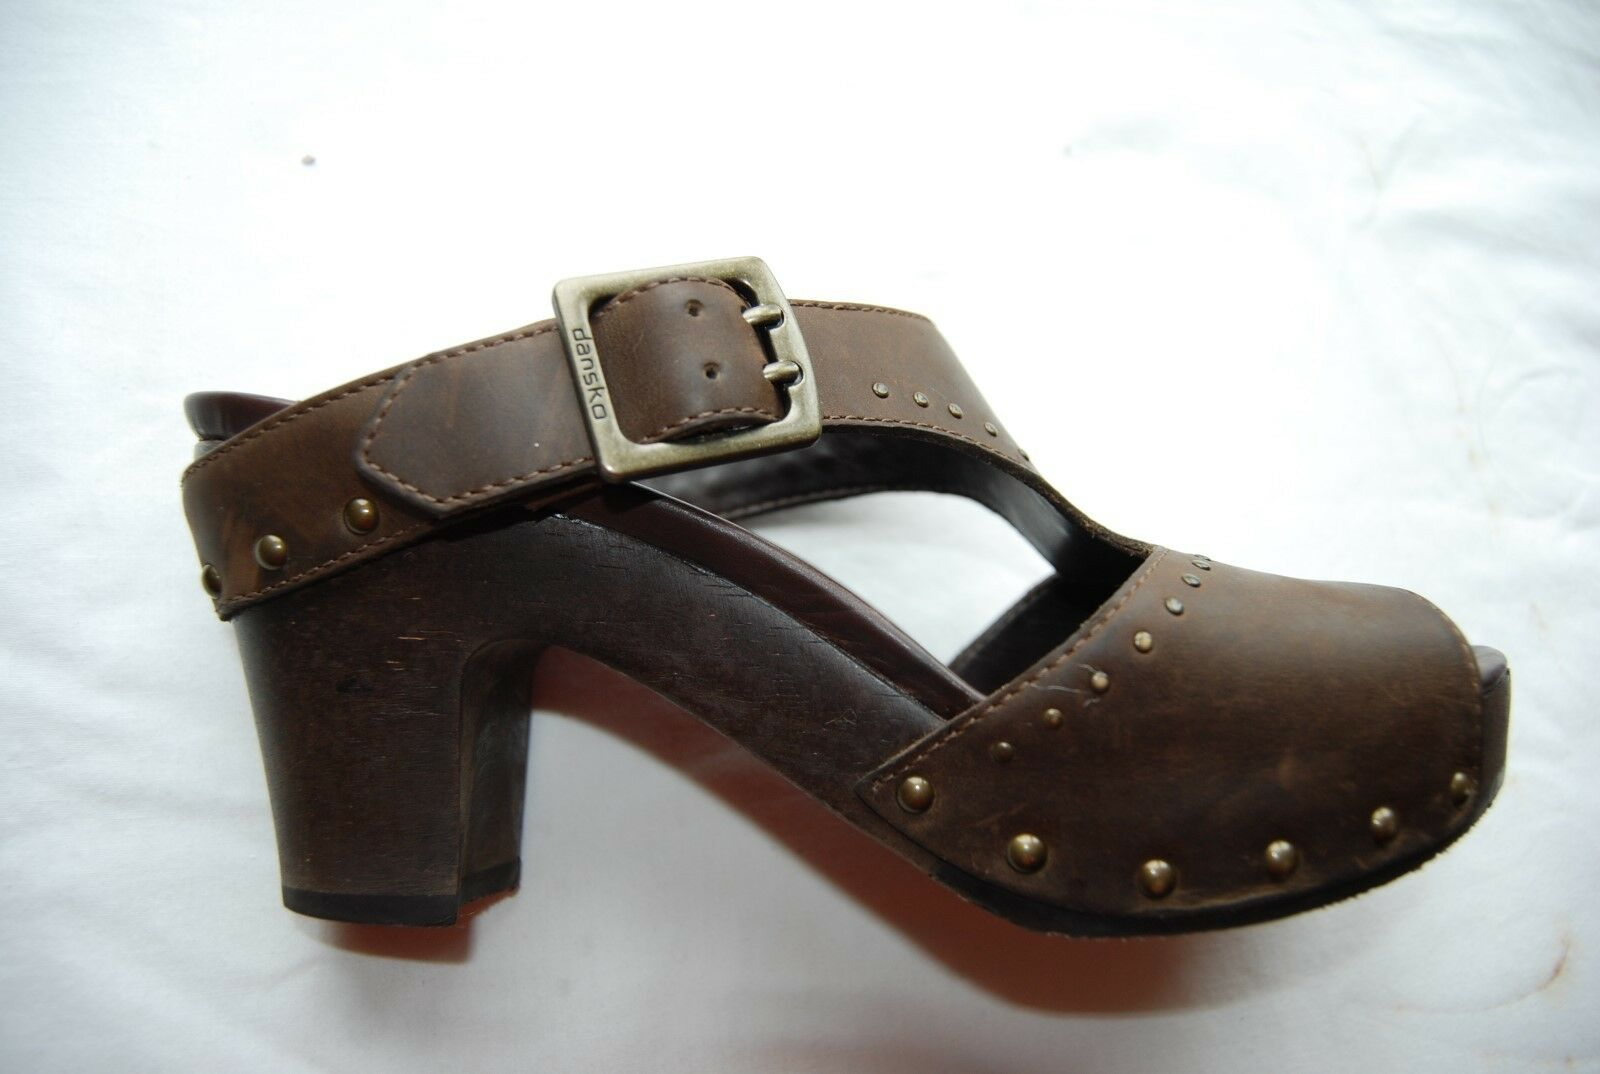 Dark Brown Leather DANSKO OpenToe Tall Slides Strap & & & Studs EU 39 US 8.5 - 9 c7777b